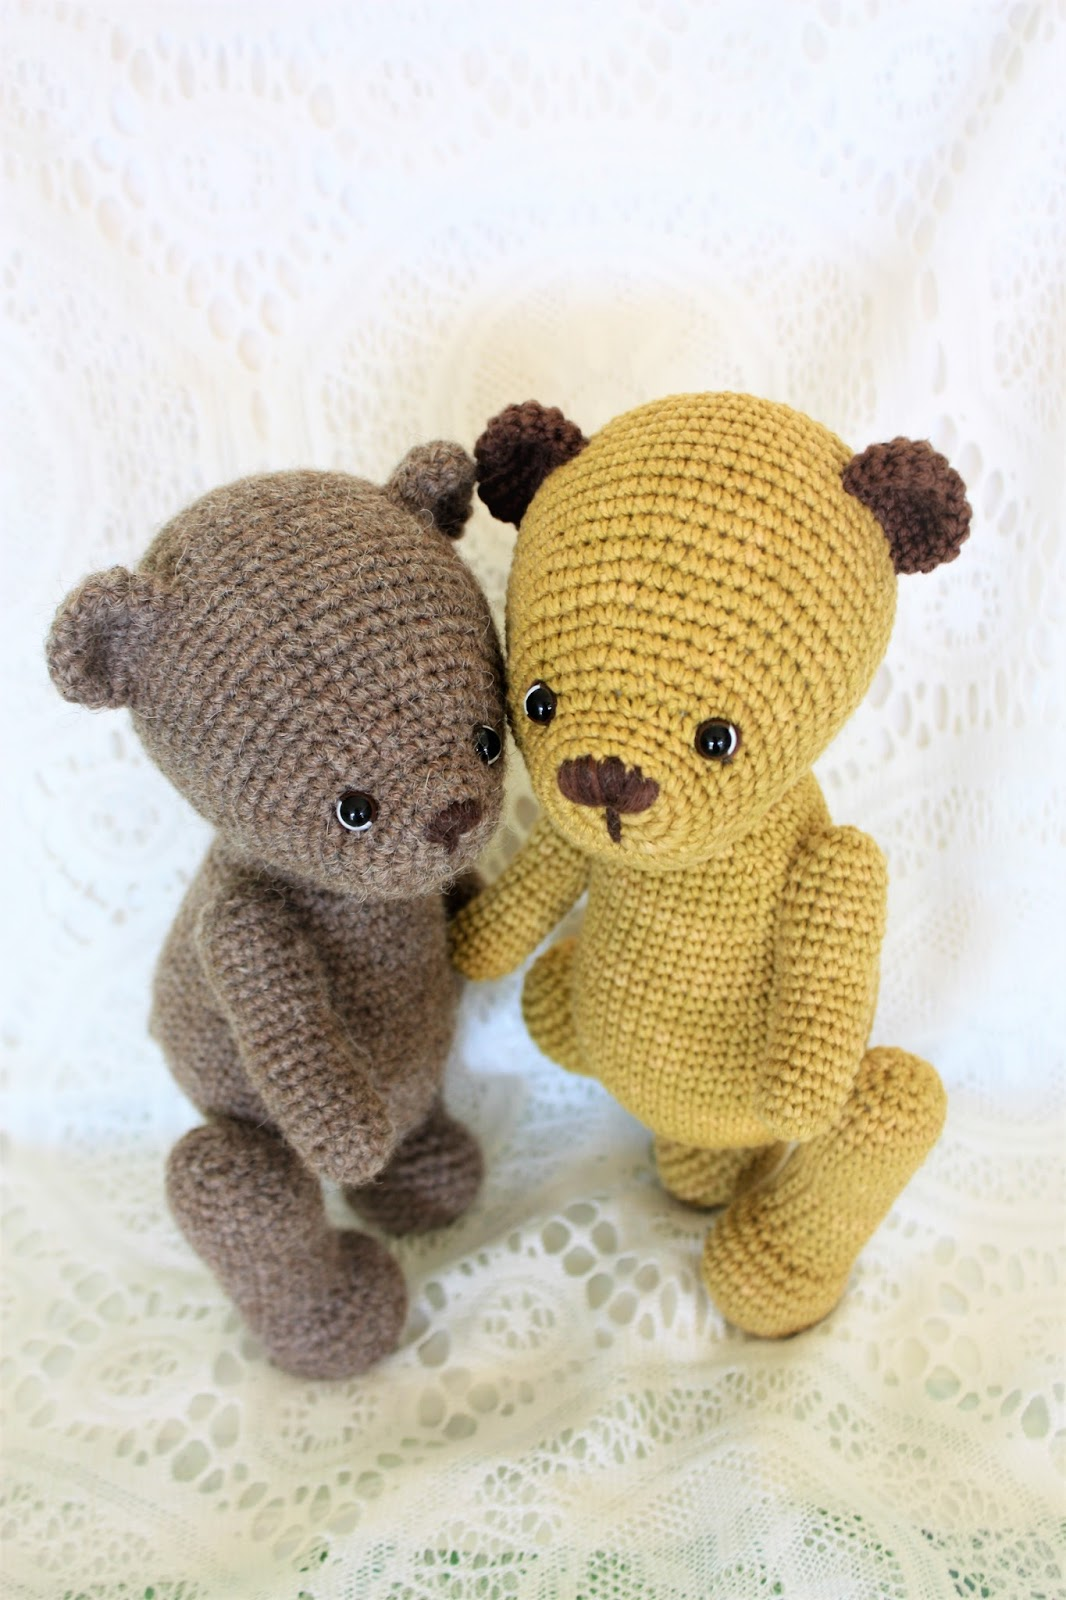 Cuddle Me Bear amigurumi pattern - Amigurumi Today | 1600x1066